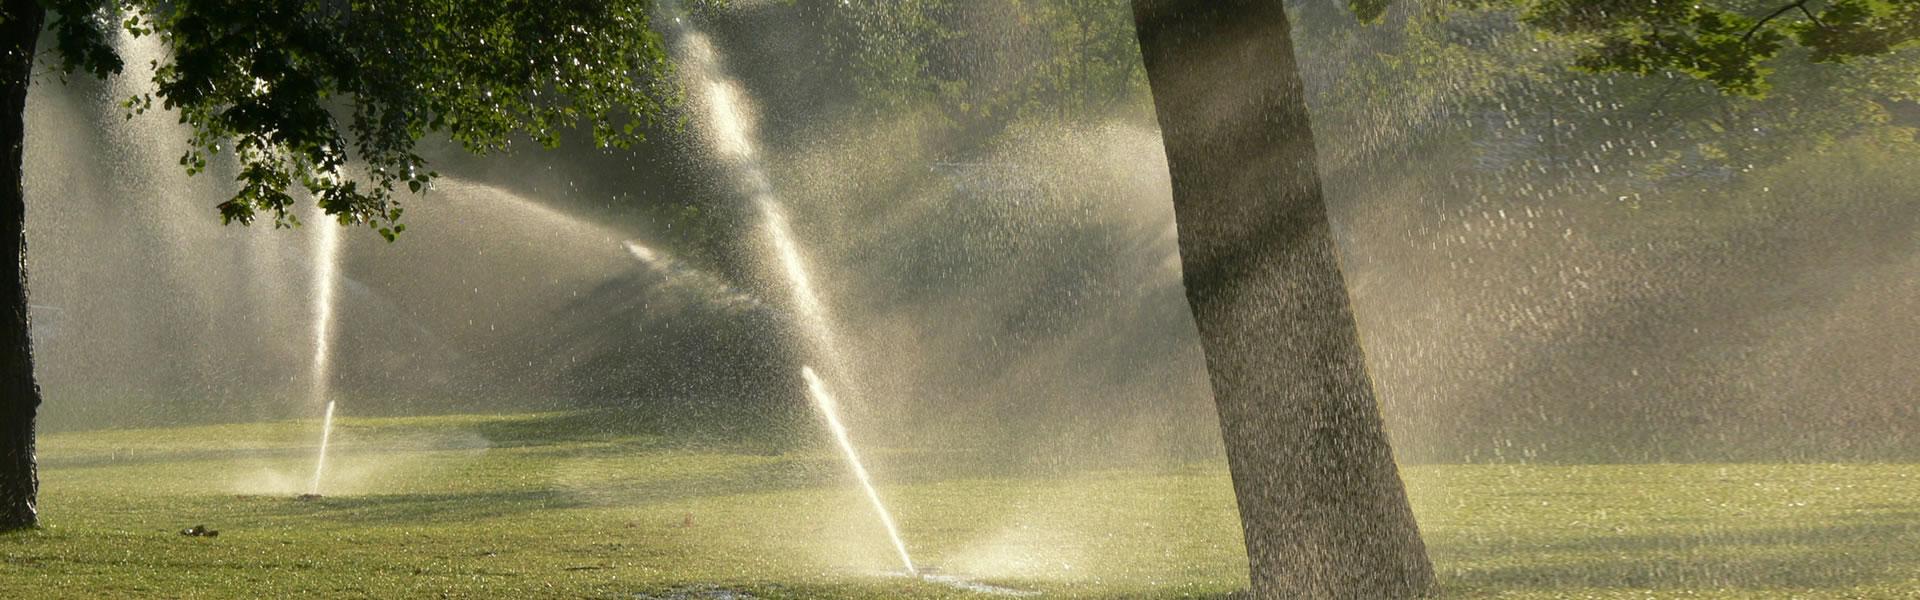 impianti irrigazione novara, biella, vercelli